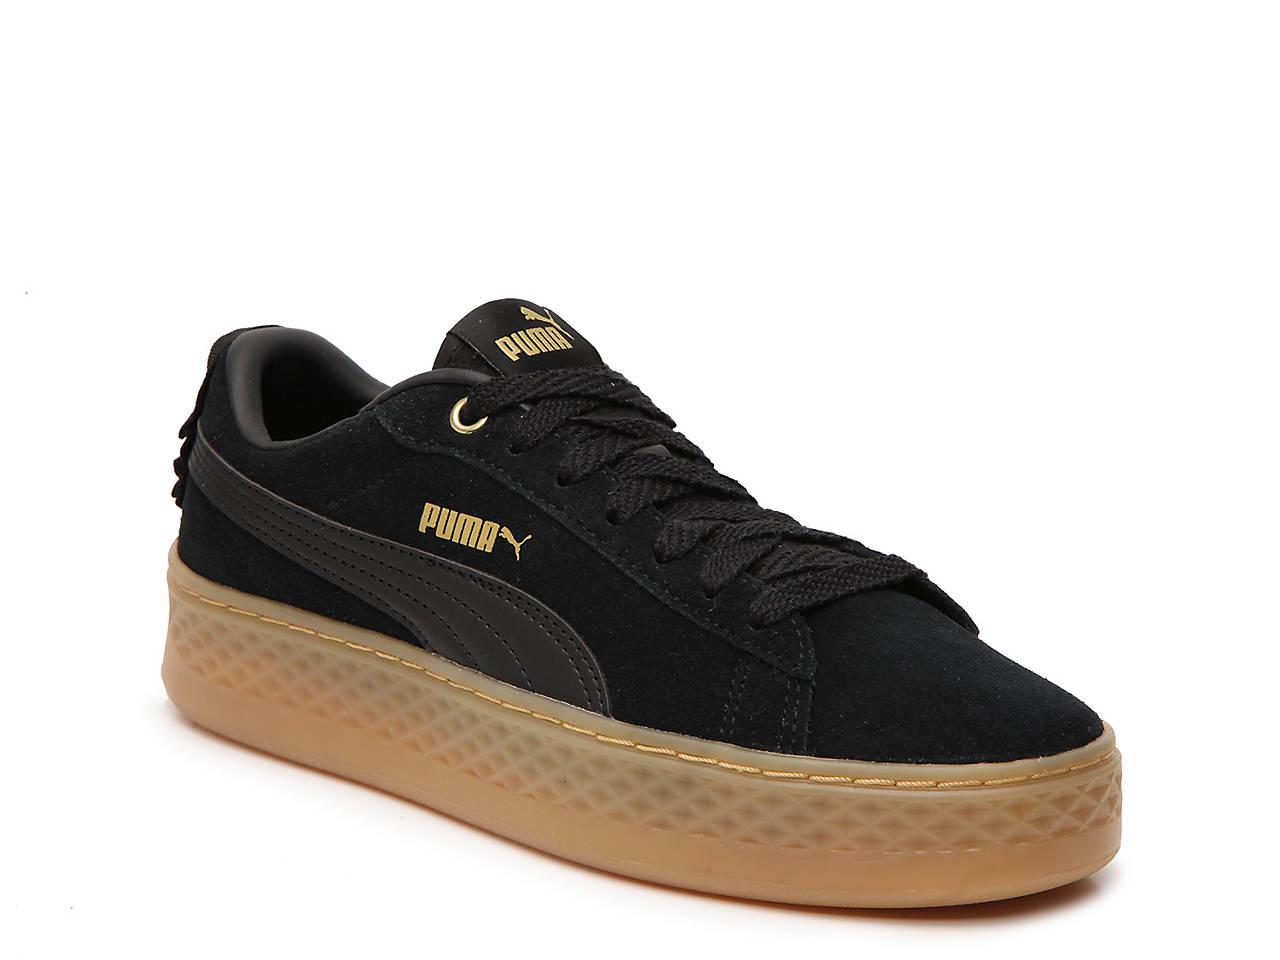 f7f3cbc00dc7 Puma Smash Platform Sneaker - Women s Women s Shoes